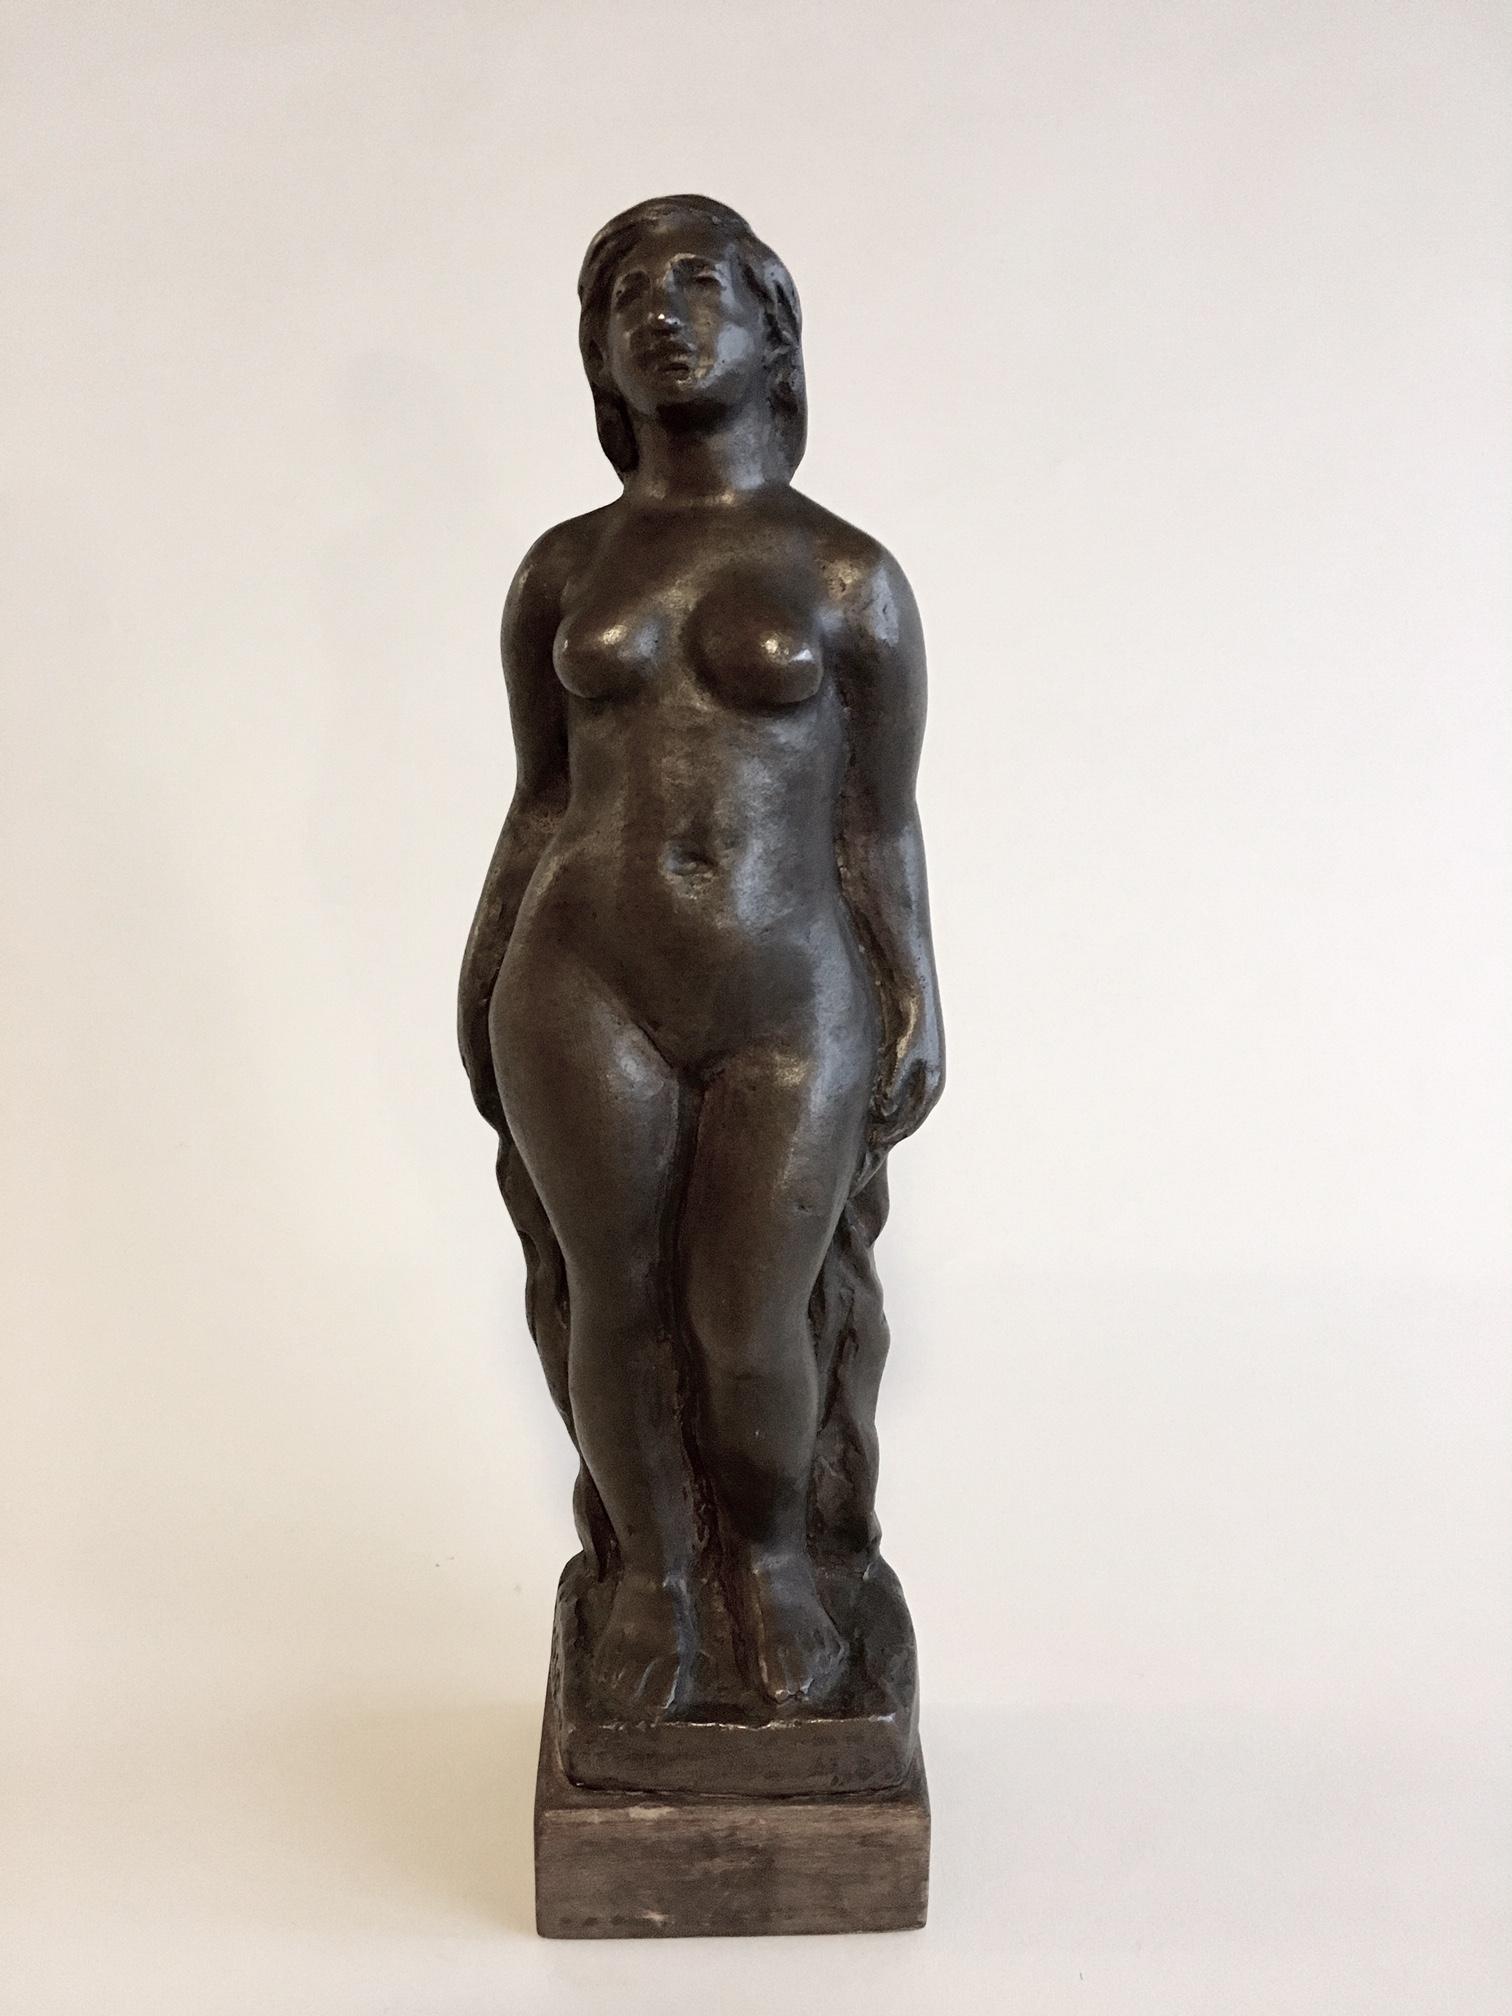 Borsos, Miklós: Standing woman nude